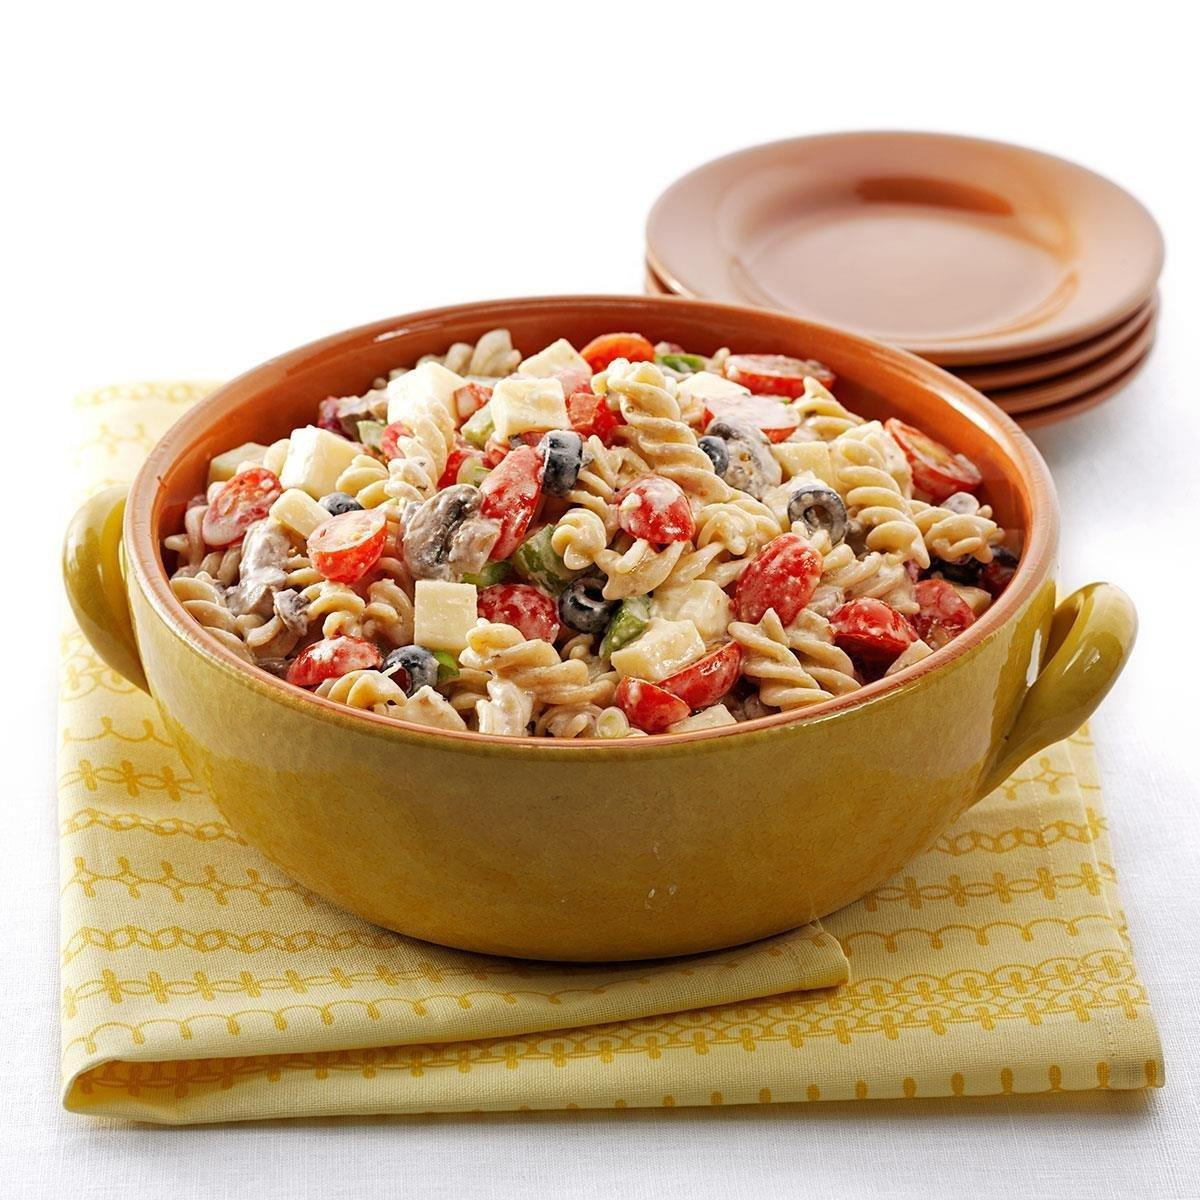 Diabetic Pasta Salad Recipes